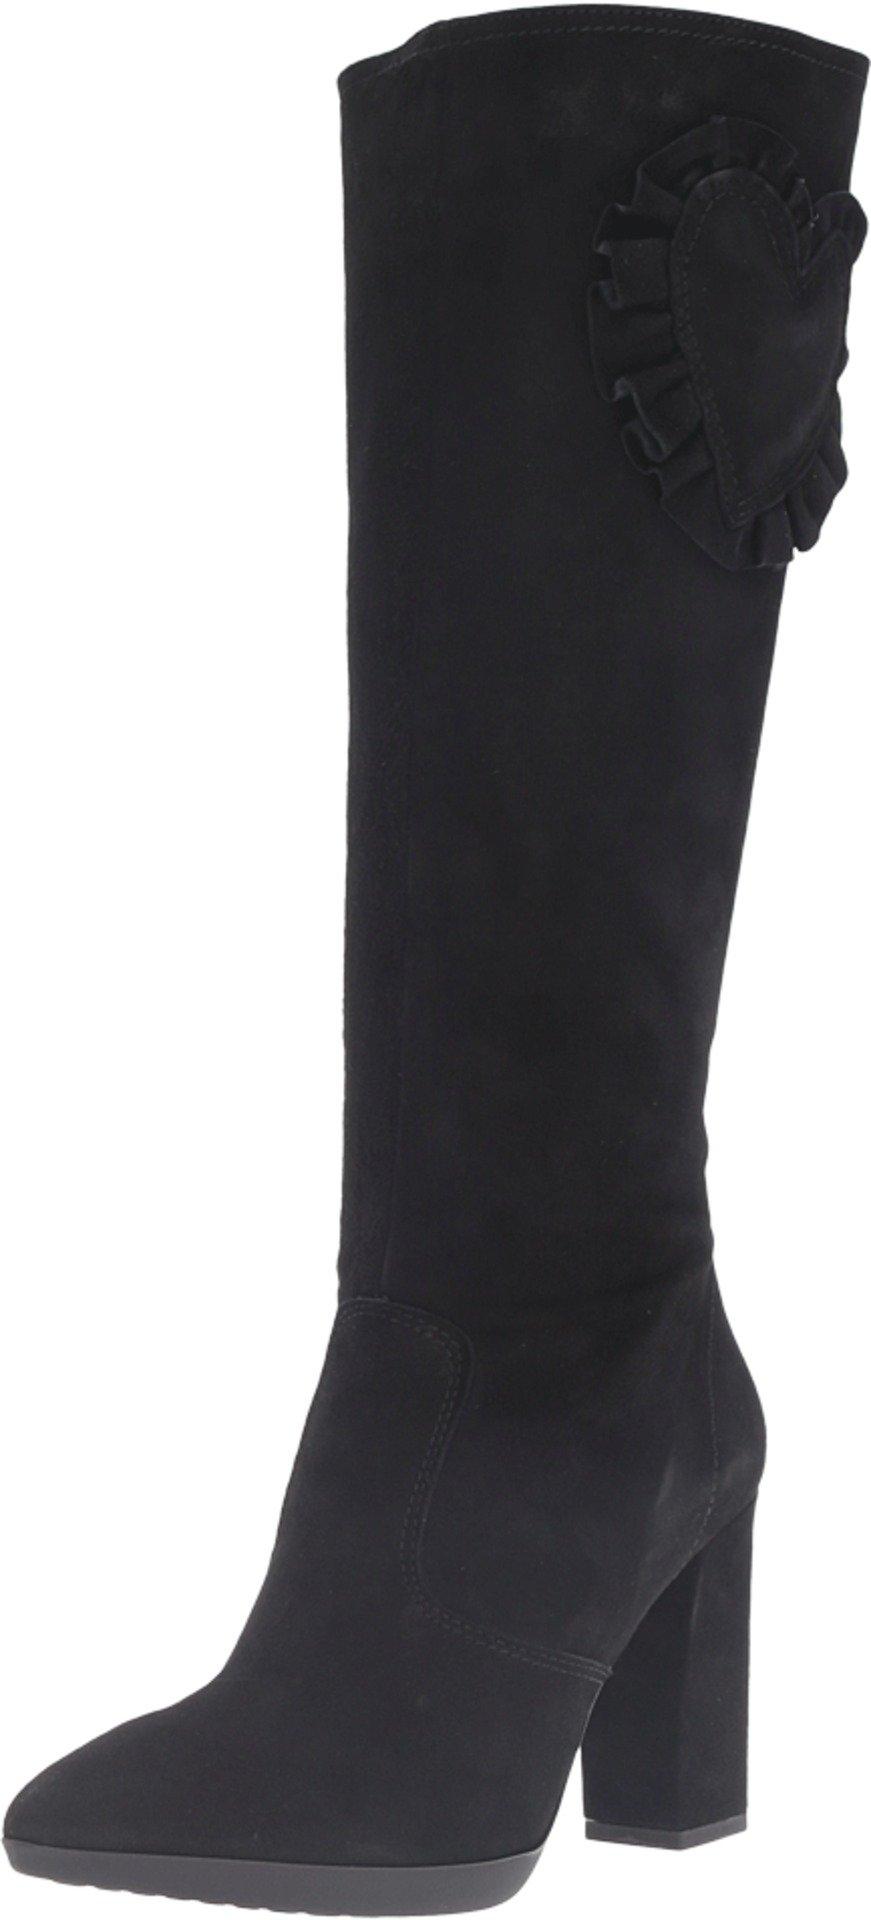 LOVE Moschino Women's Suede Rider Boot with Heel Black Boot 40 (US Women's 10) M